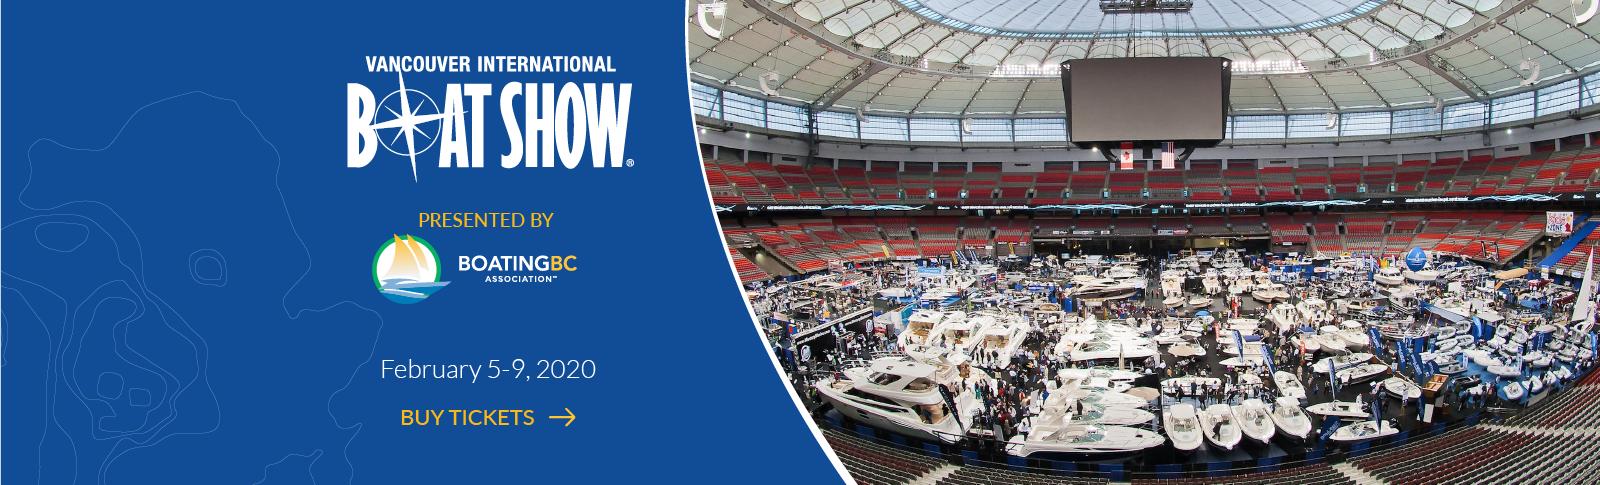 Boat Show, British Columbia, Vancouver